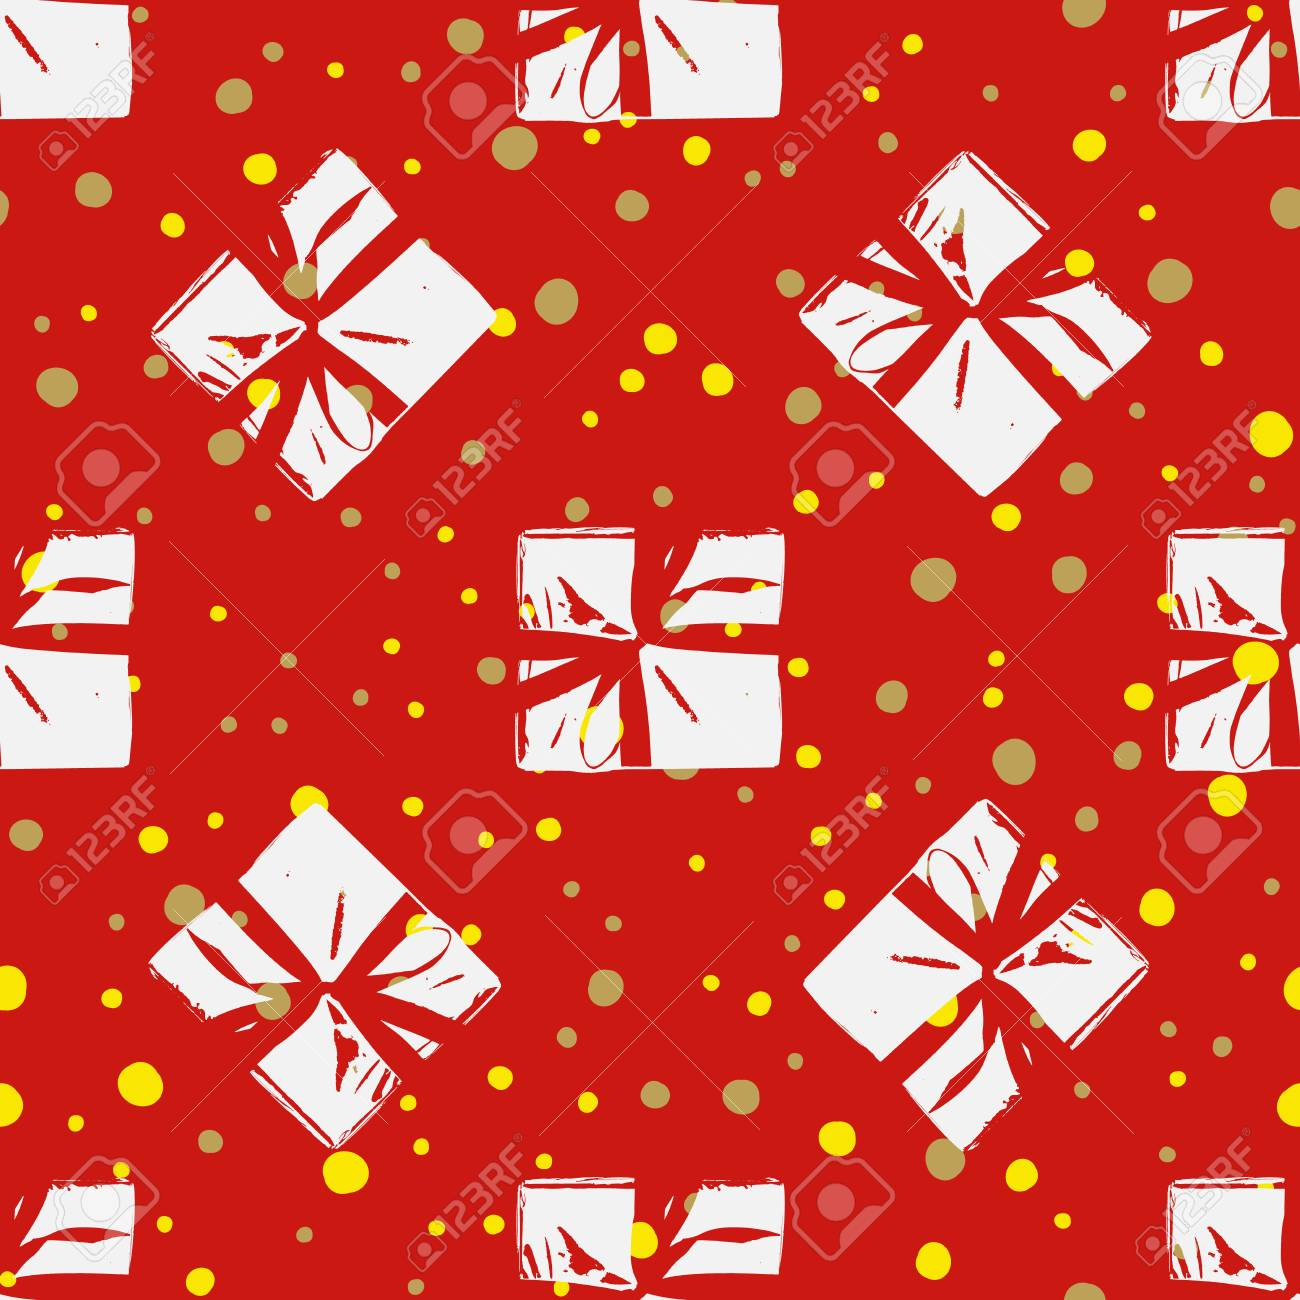 Christmas Gift Wrapper Design.Winter Seamless Pattern With Christmas Gift Boxes Wrapped Boxes